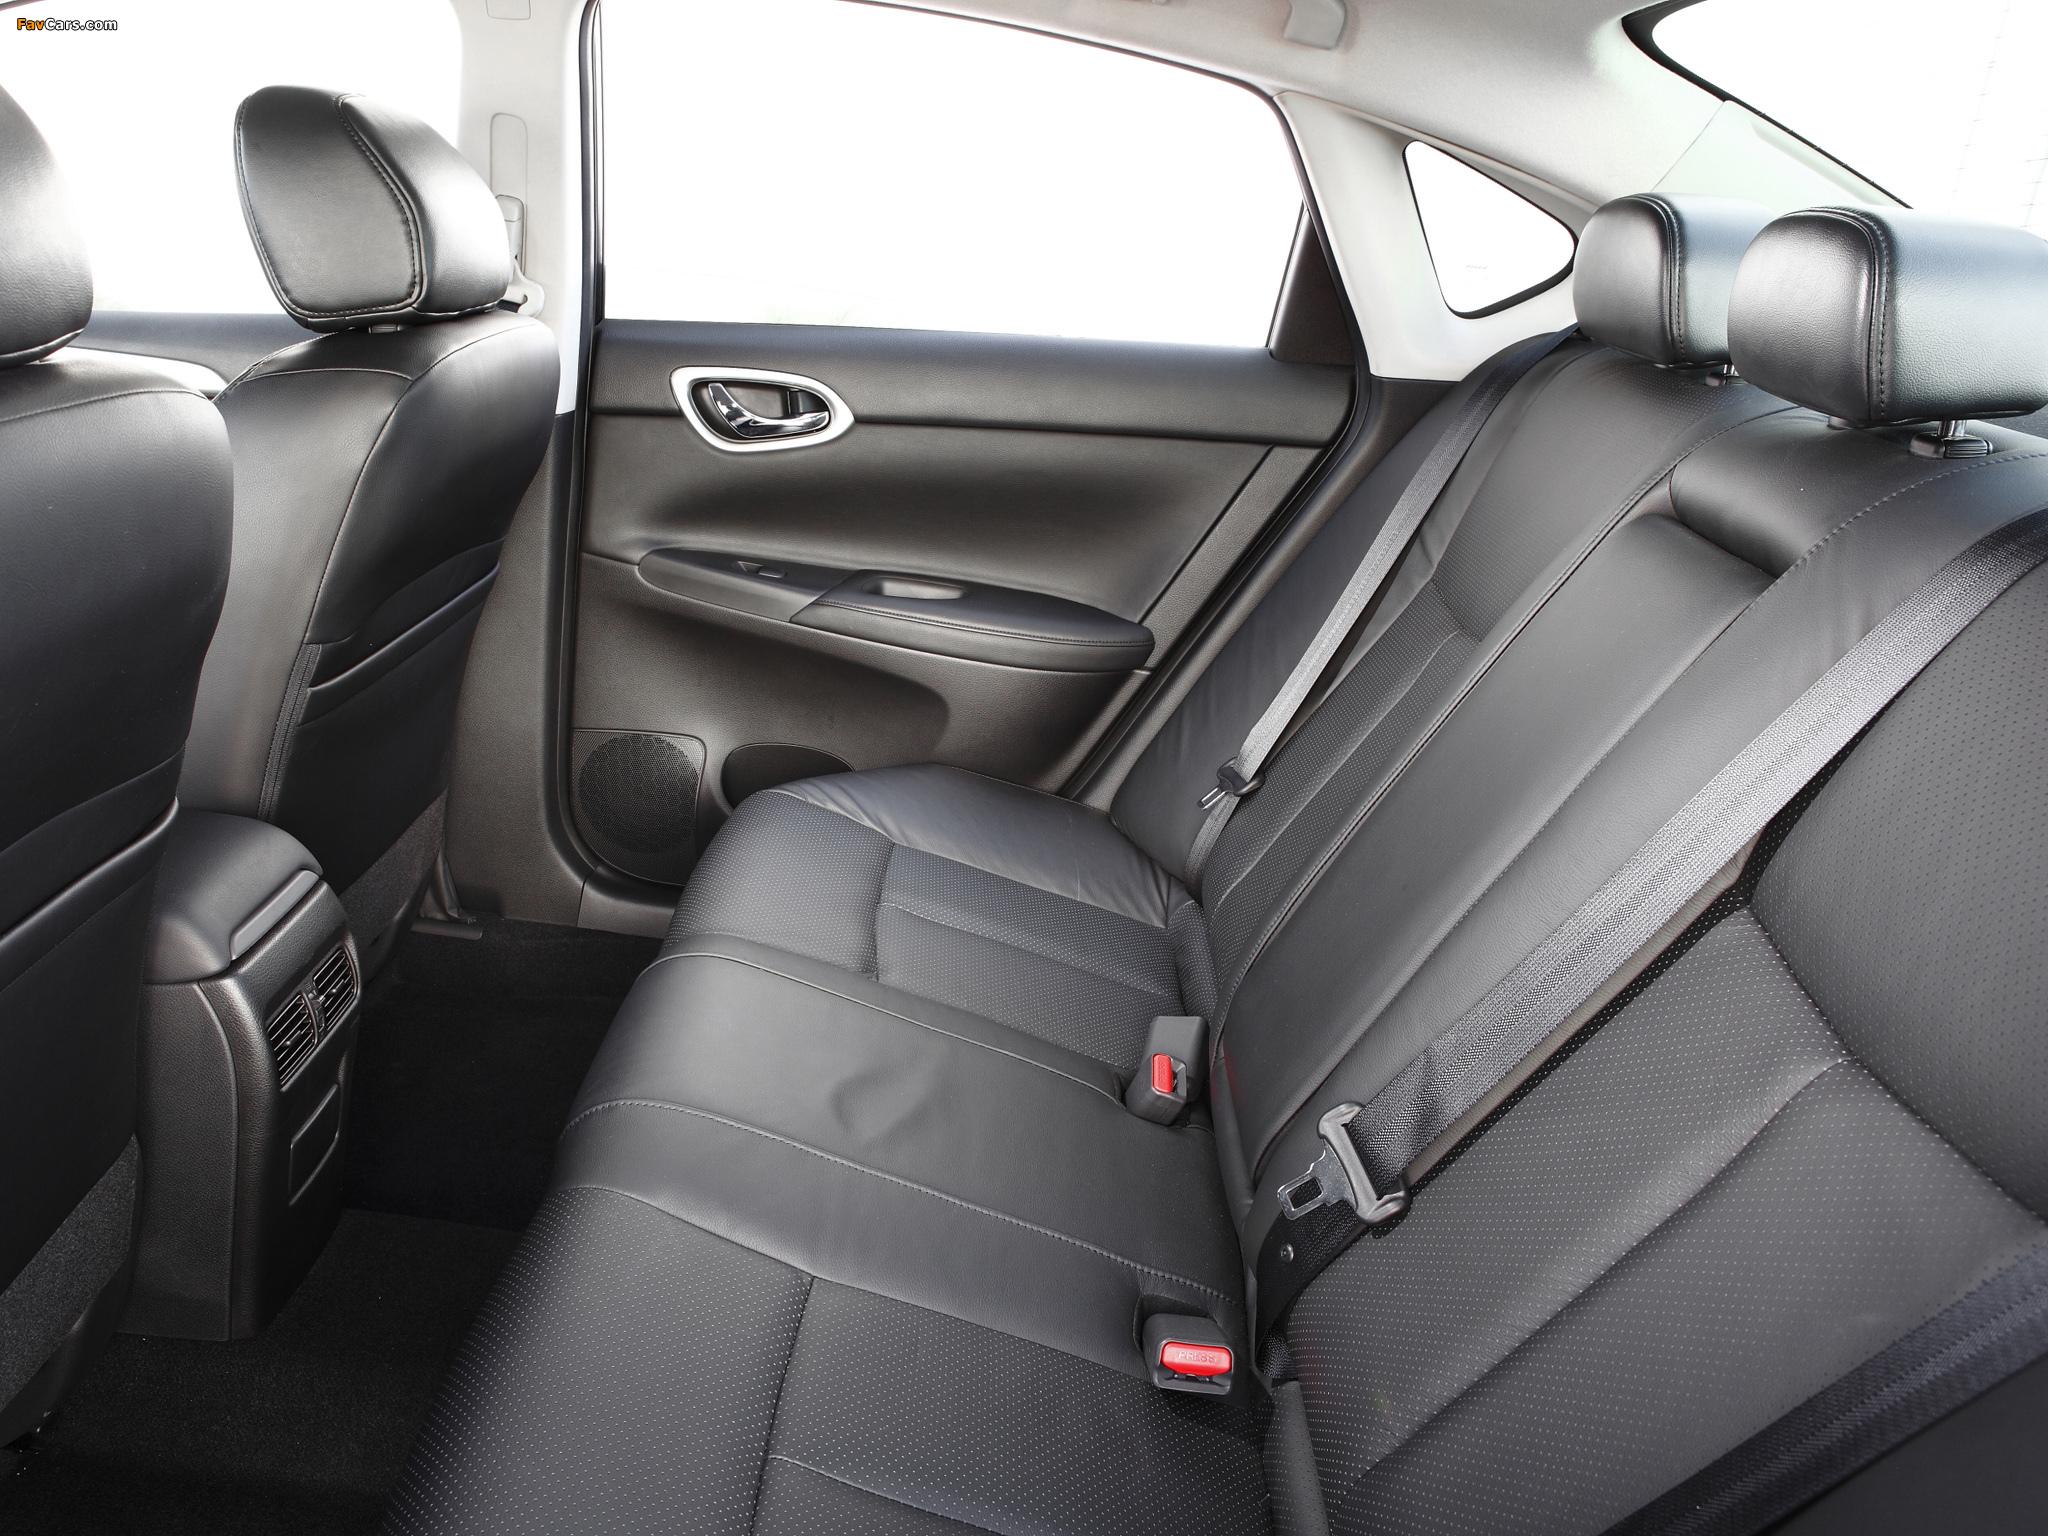 Nissan Pulsar (NB17) 2013 images (2048 x 1536)